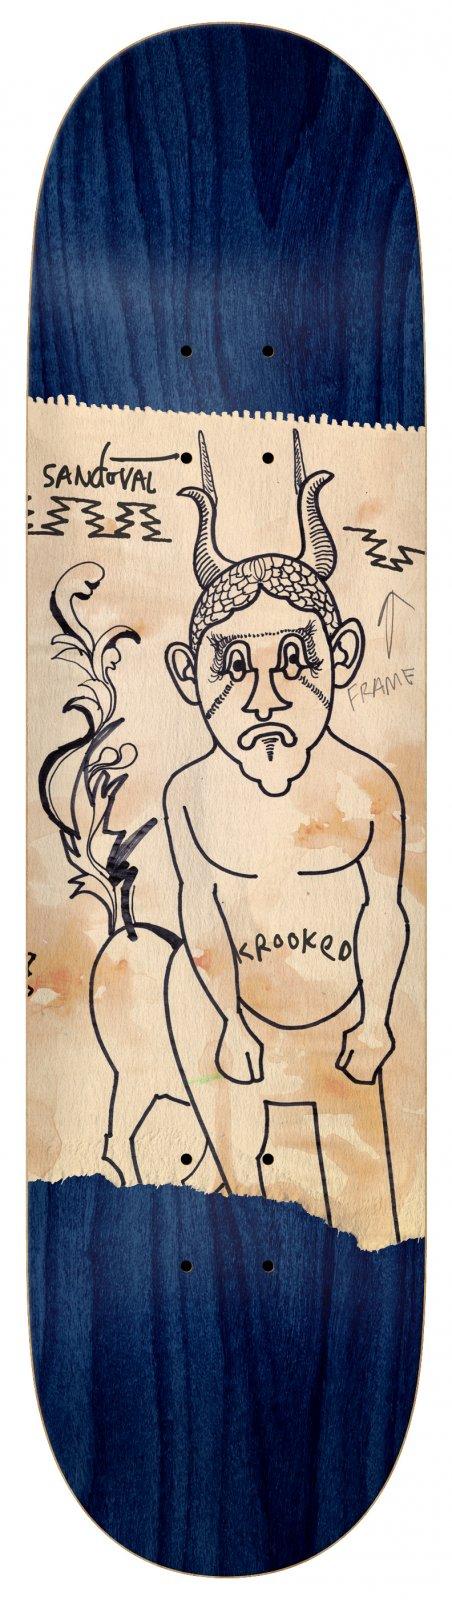 Krooked SANDOVAL GOAT DUDE 8.25 x 32